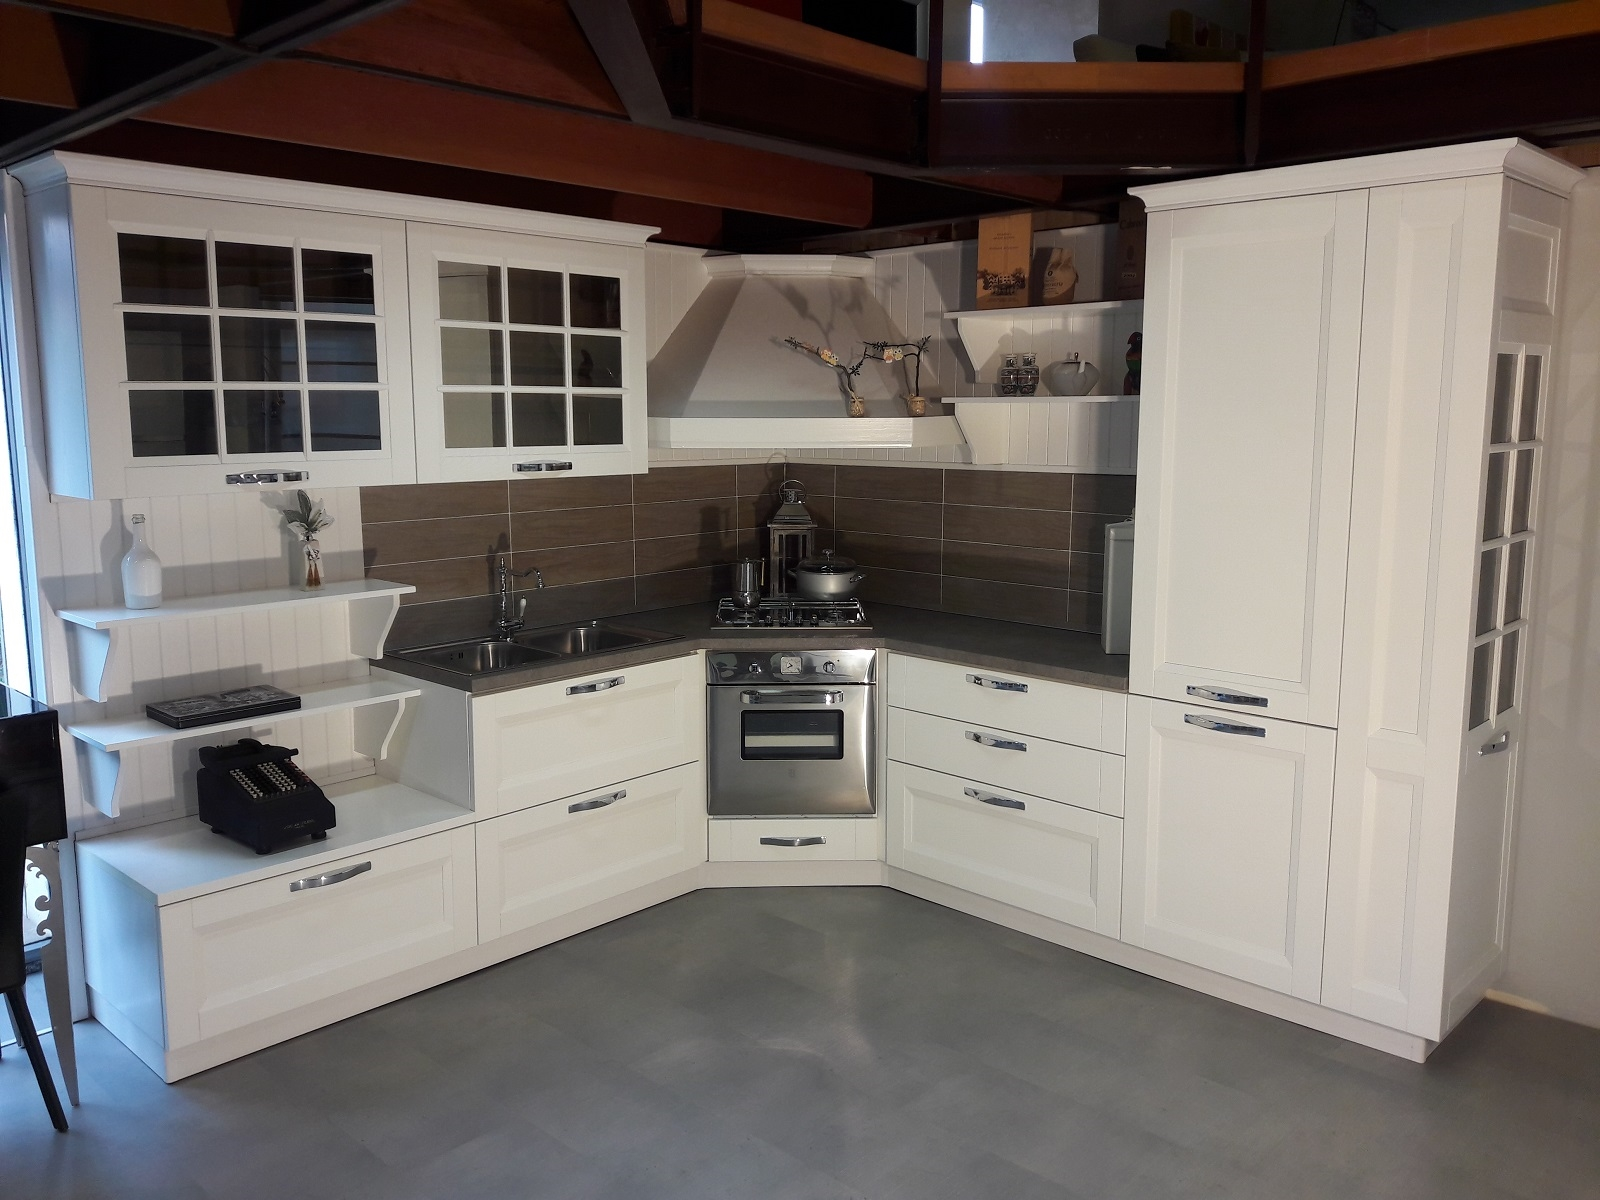 Emejing Cucina Beverly Stosa Images - acrylicgiftware.us ...